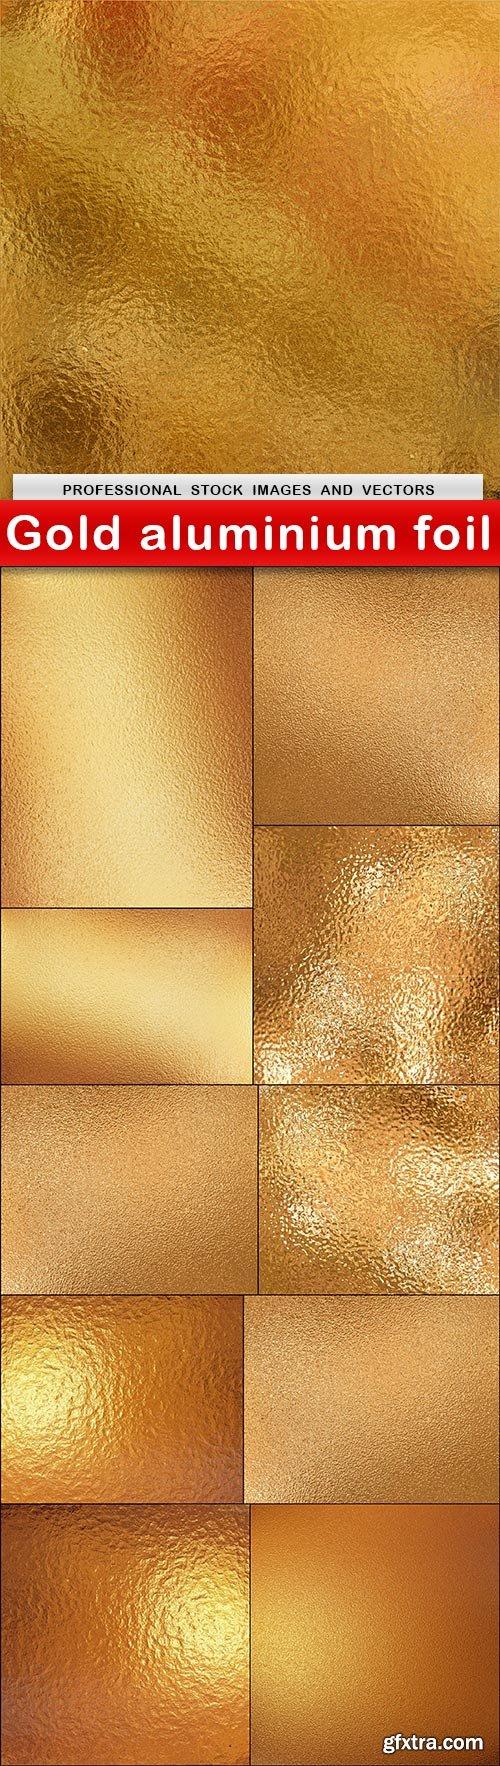 Gold aluminium foil - 11 UHQ JPEG